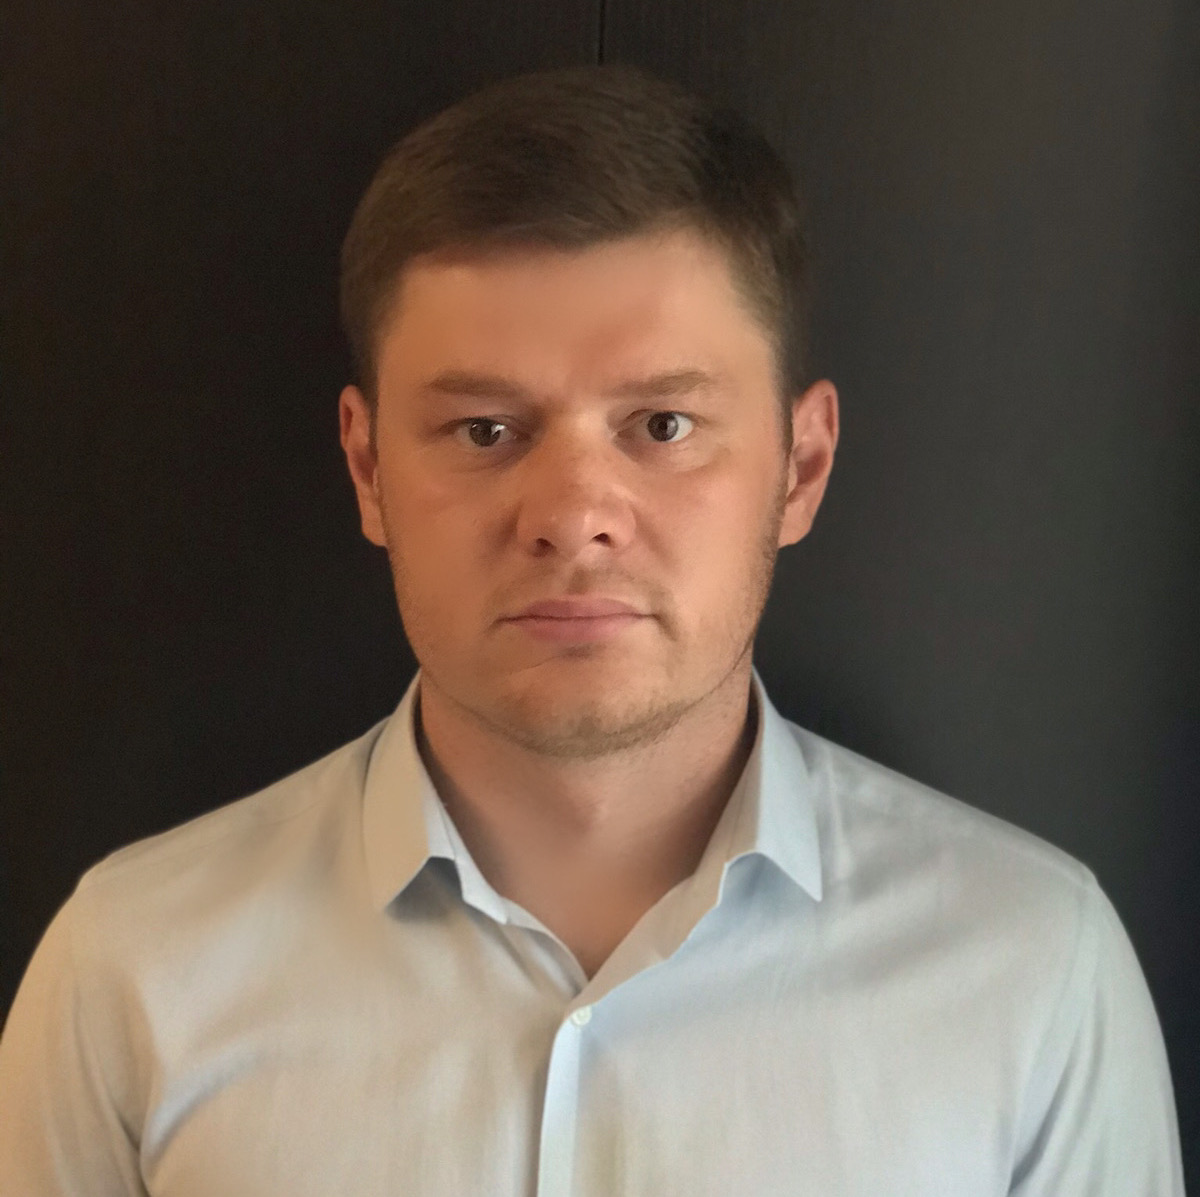 Евгений Инюшин, Сименс